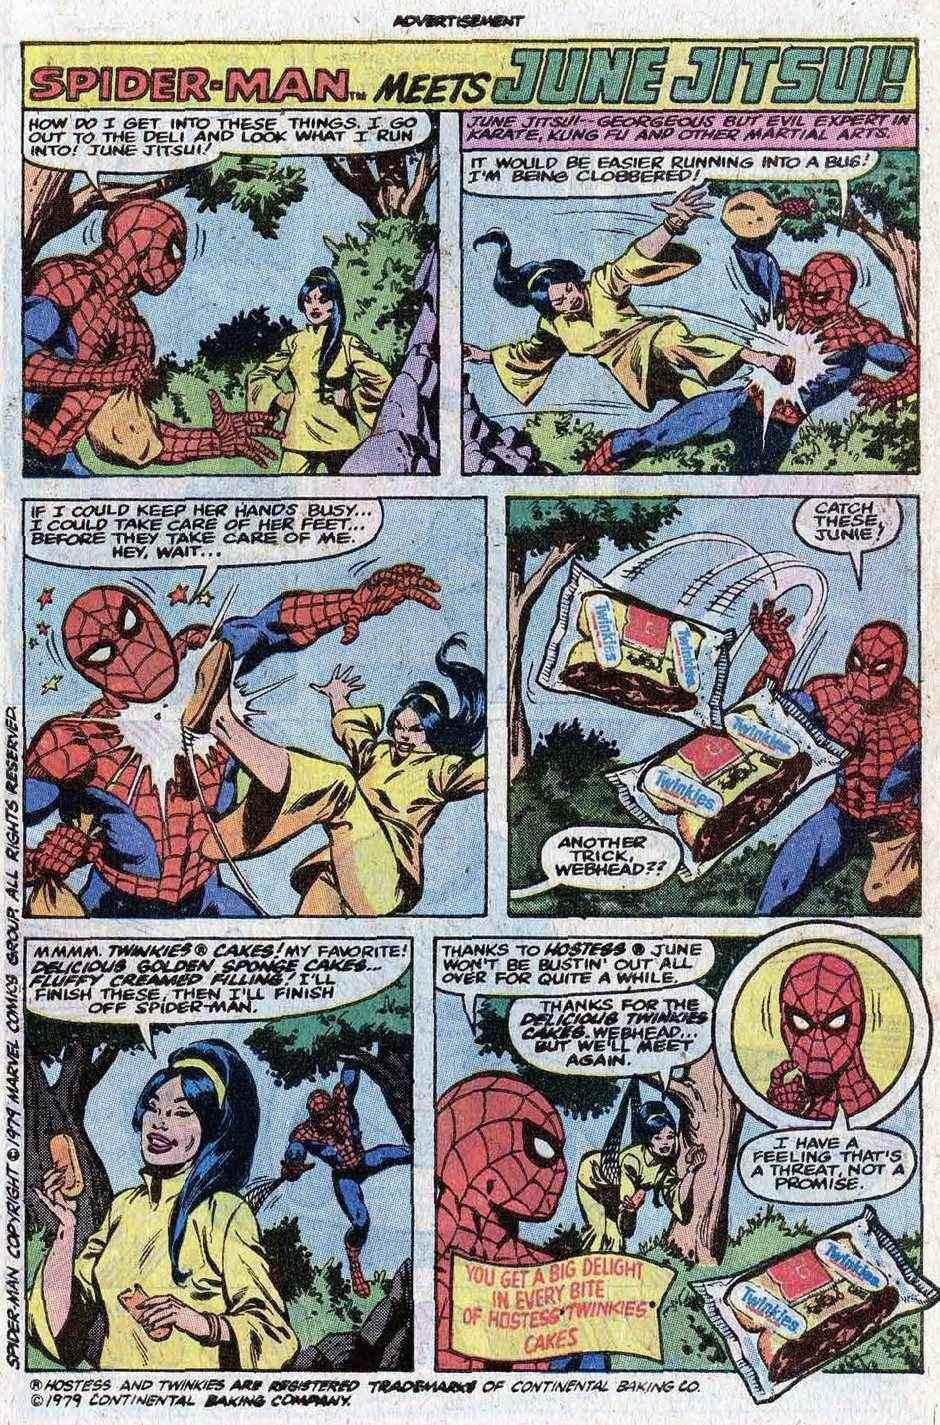 Fantastic Four Vol 1 213 page 30.jpg